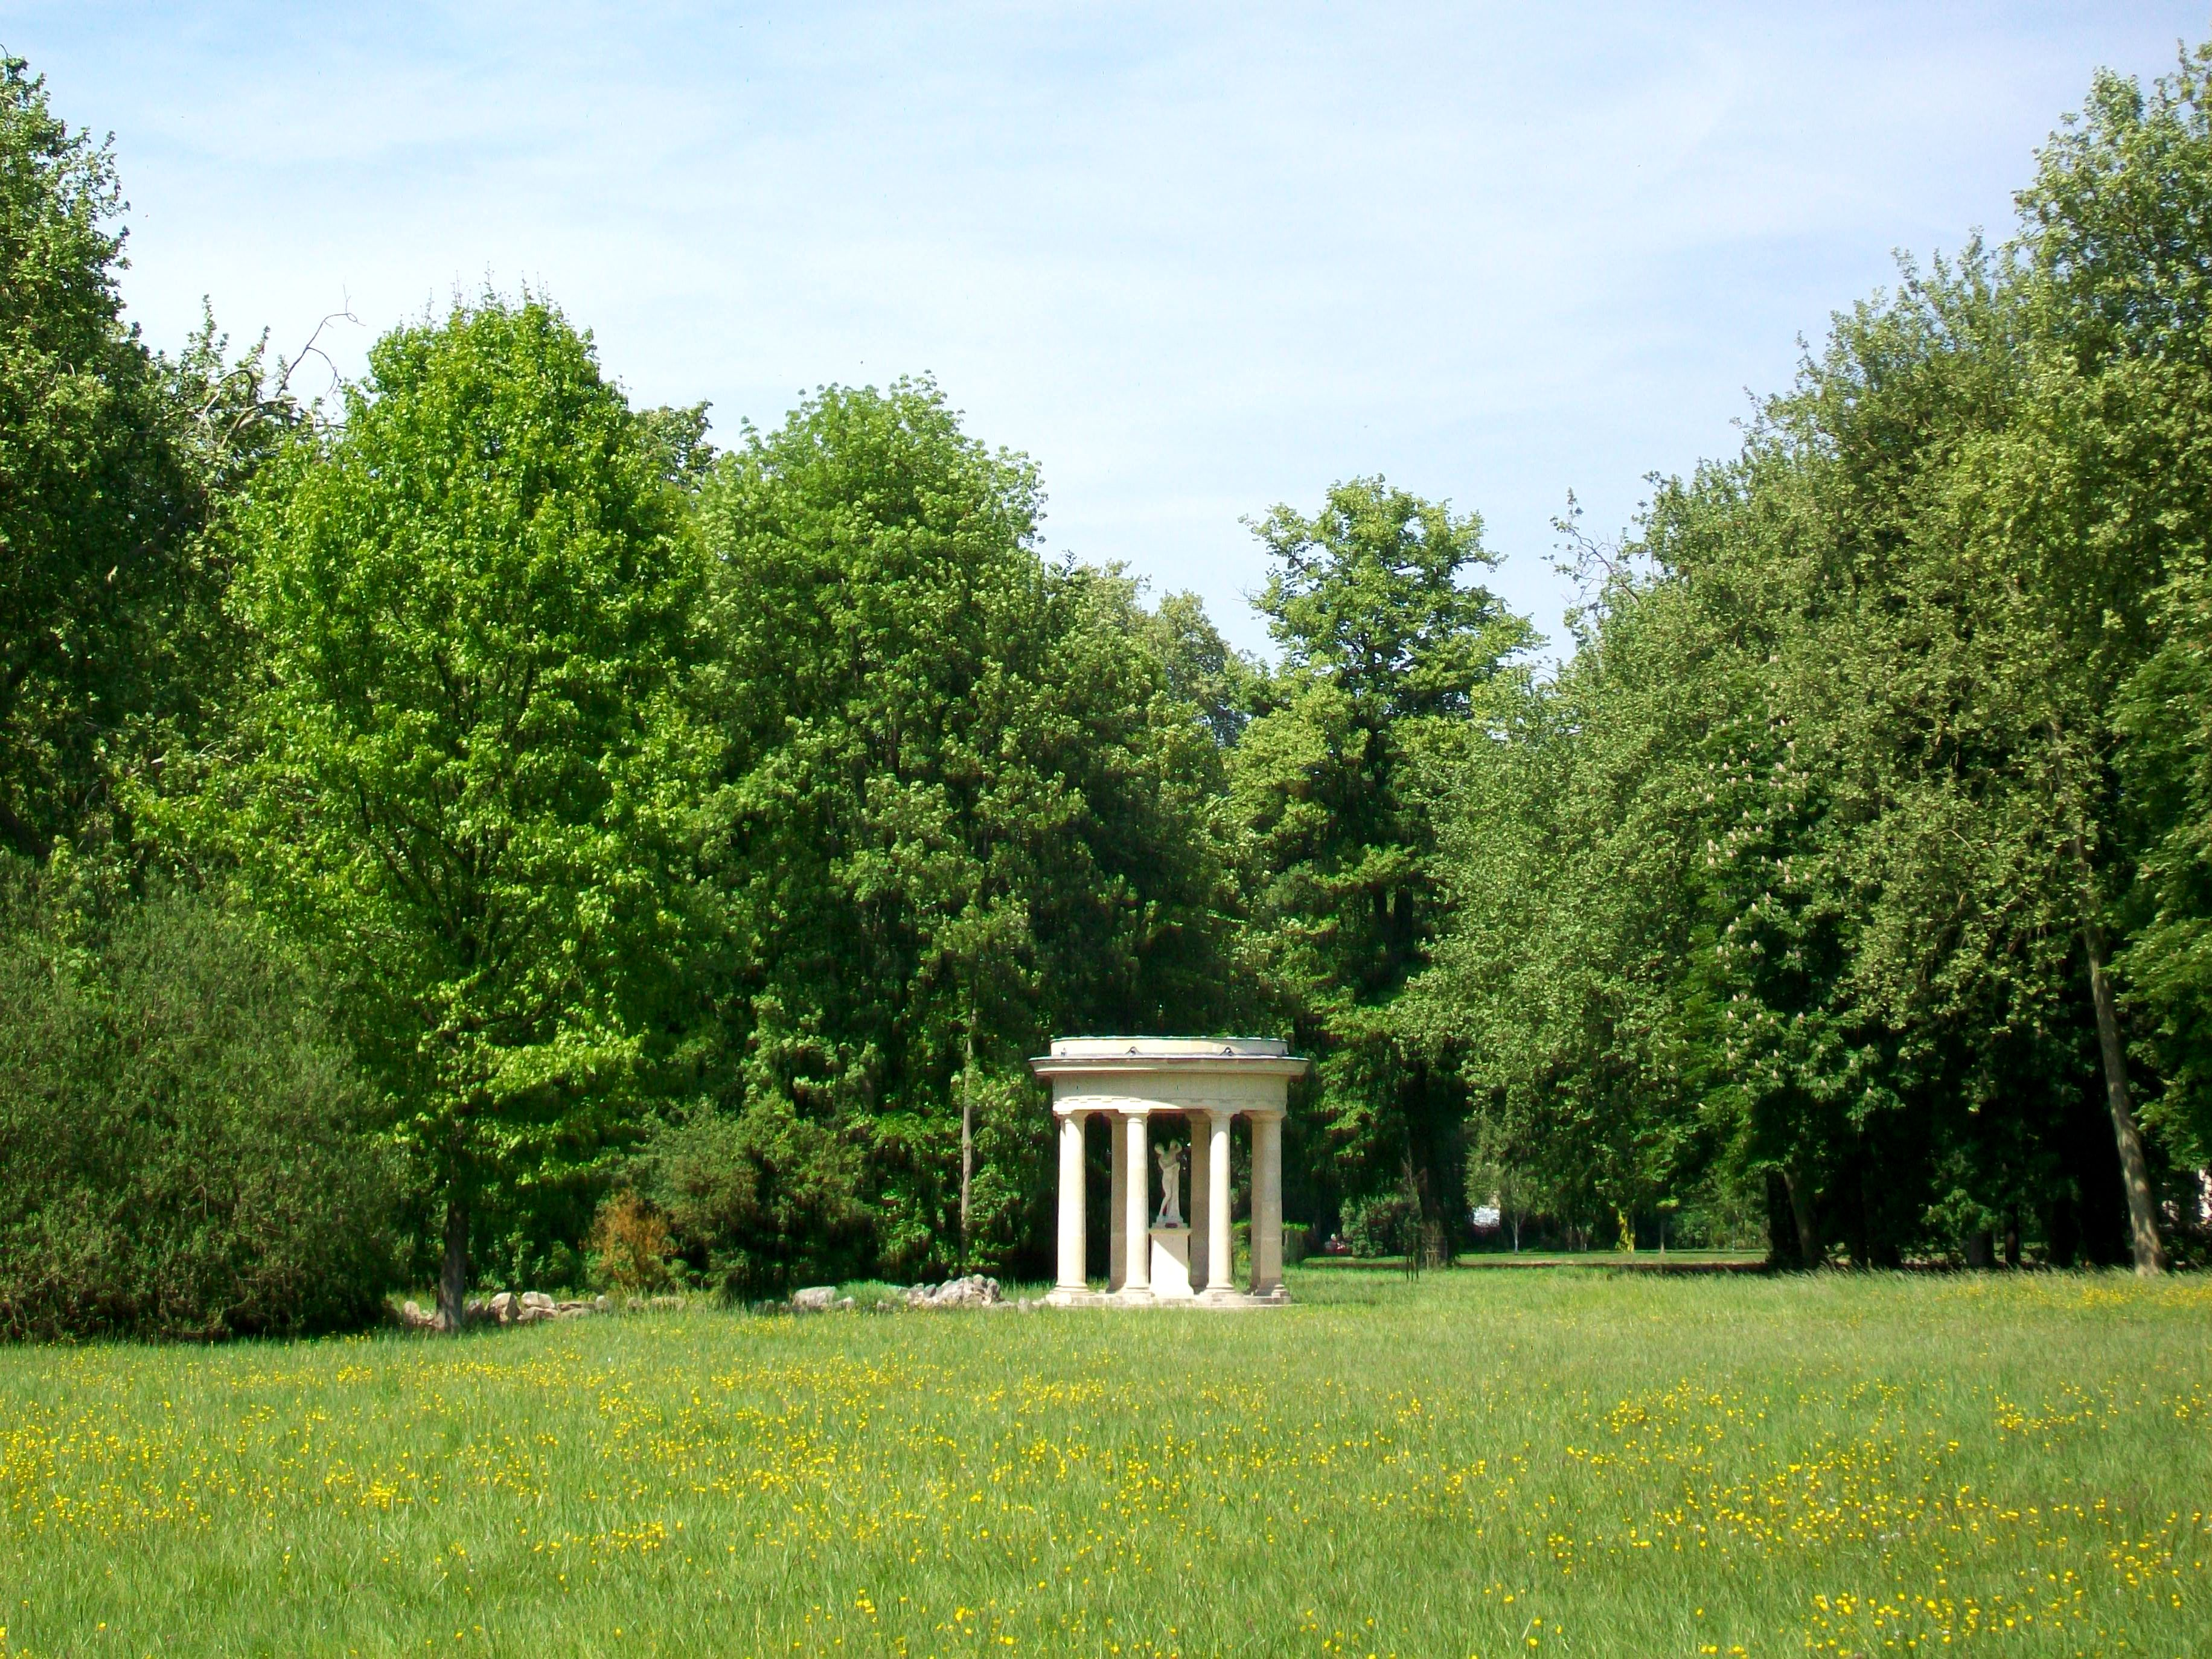 Image gallery jardin anglais for Jardin anglais vesoul